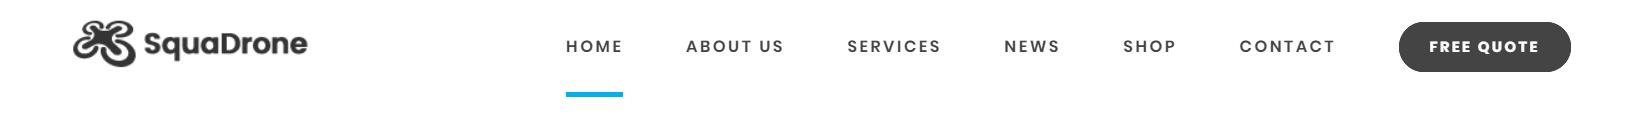 https://documentation.bold-themes.com/squadrone/wp-content/uploads/sites/29/2018/02/alt-logo.png